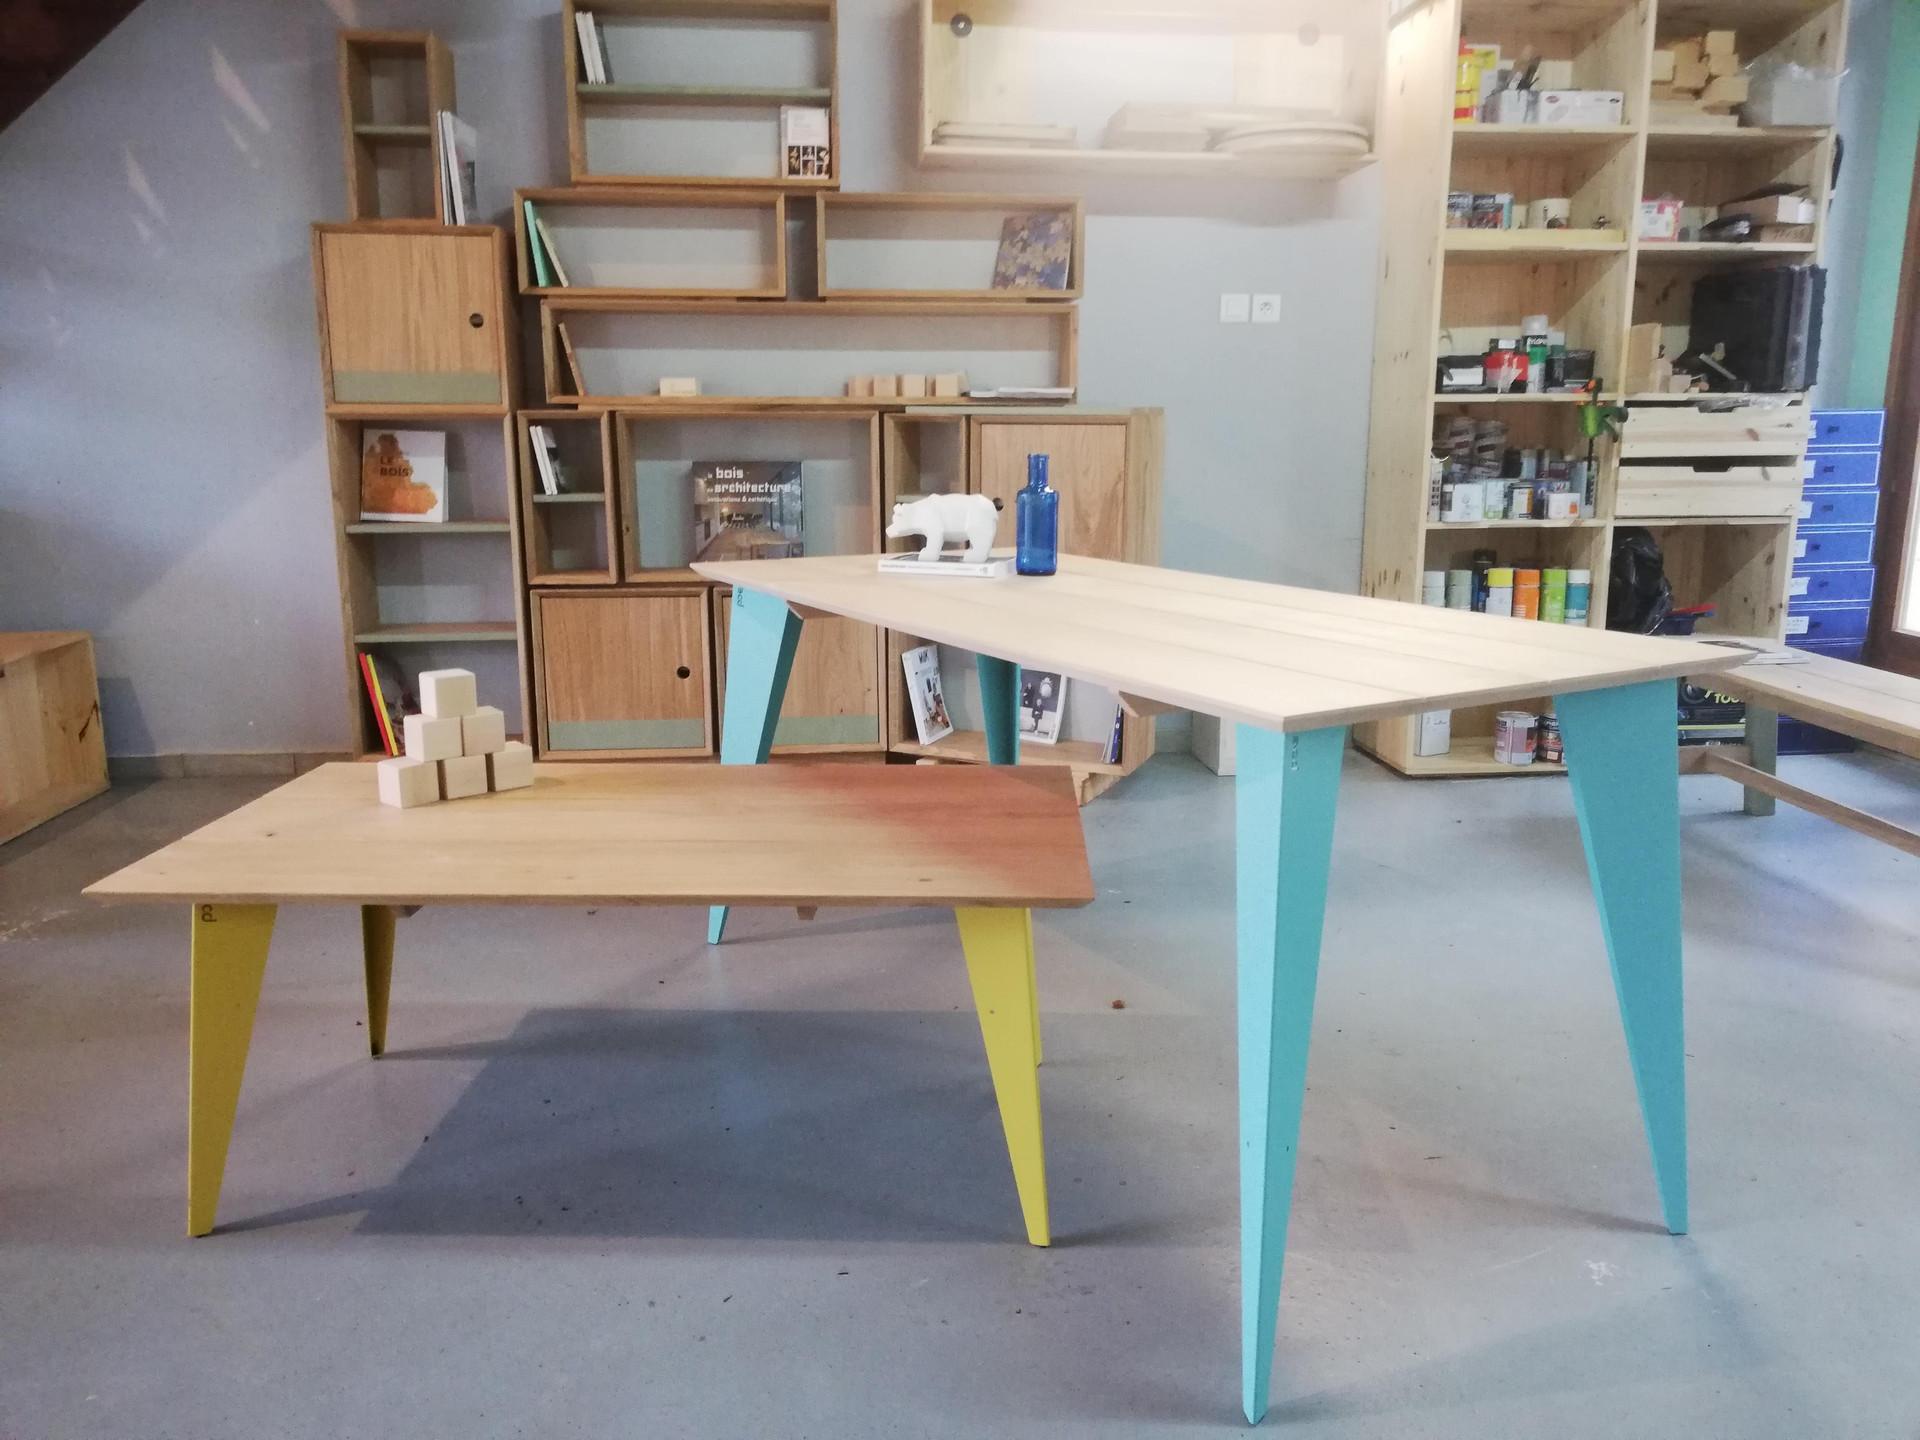 Tables Collection Bleu-Puy Tables Collection Bleu-Puy  #PuysMobilier